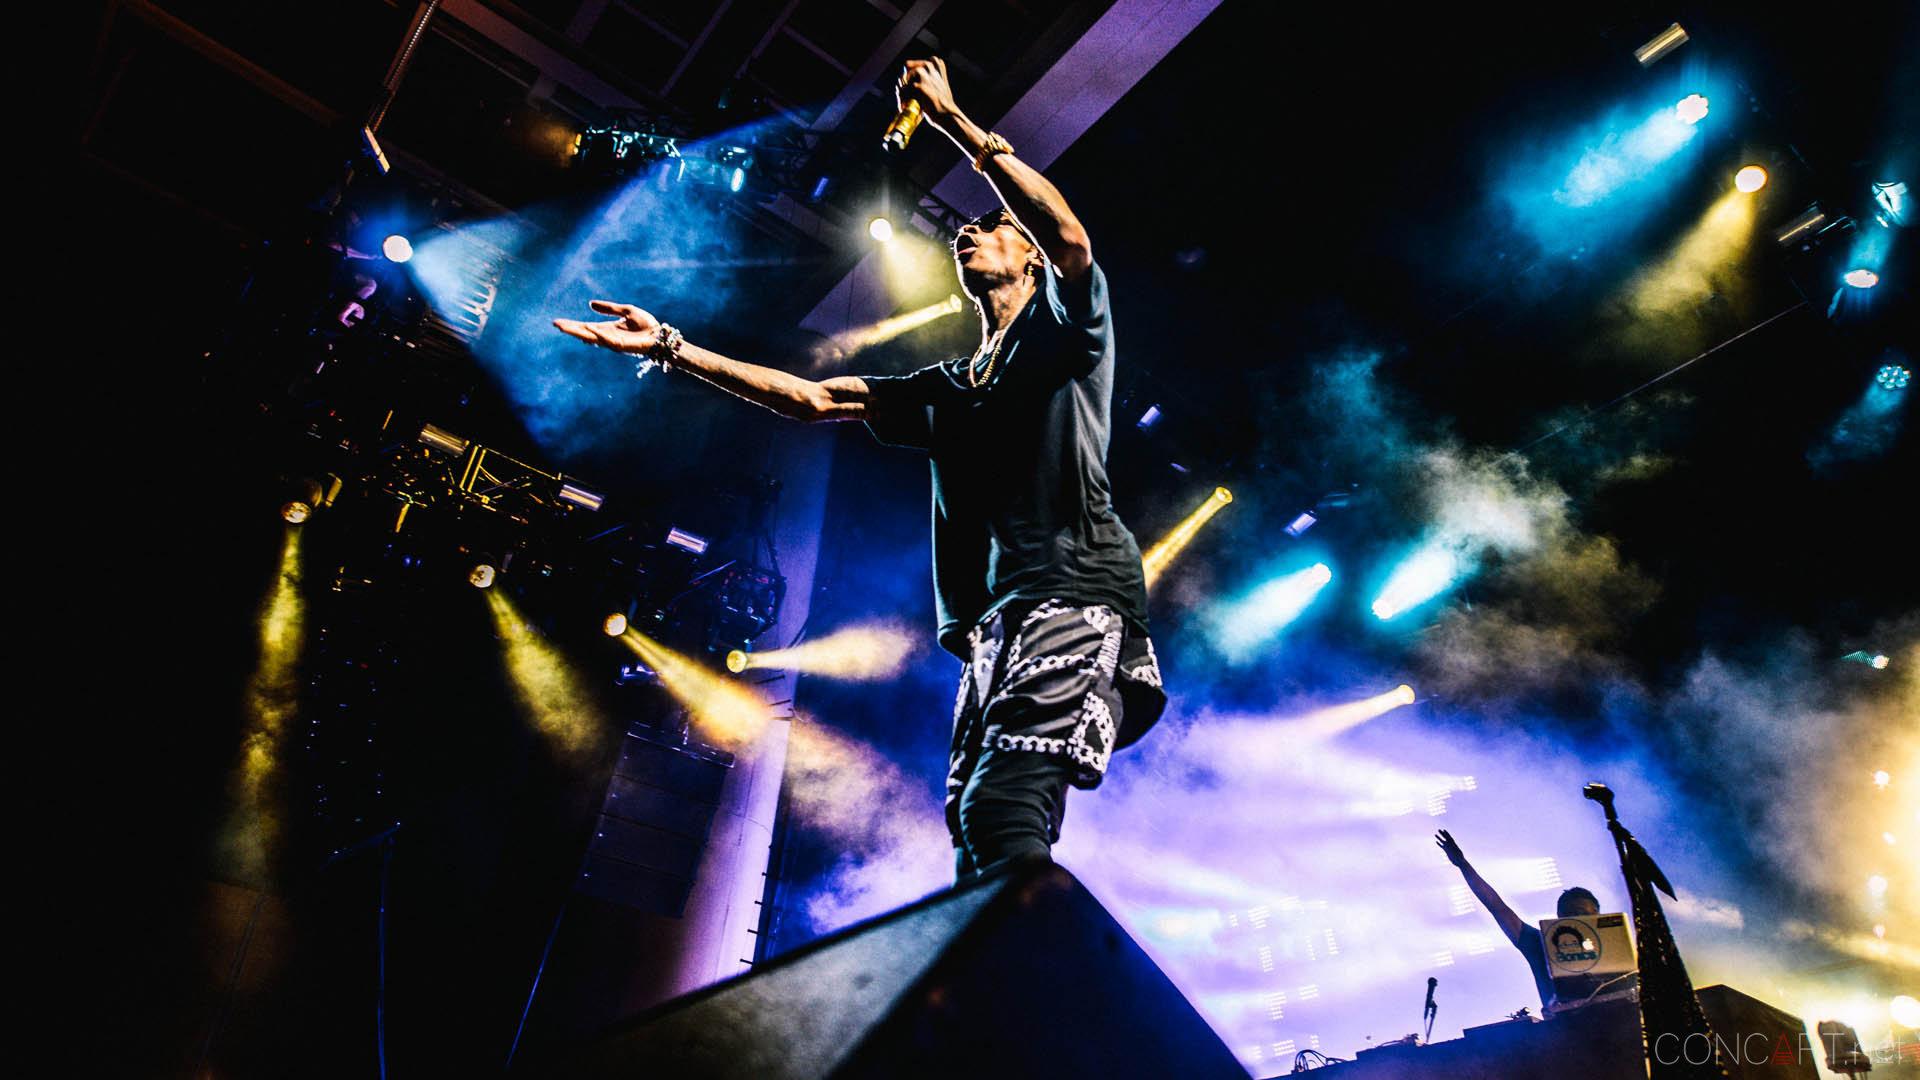 Wiz Khalifa Live Wallpaper